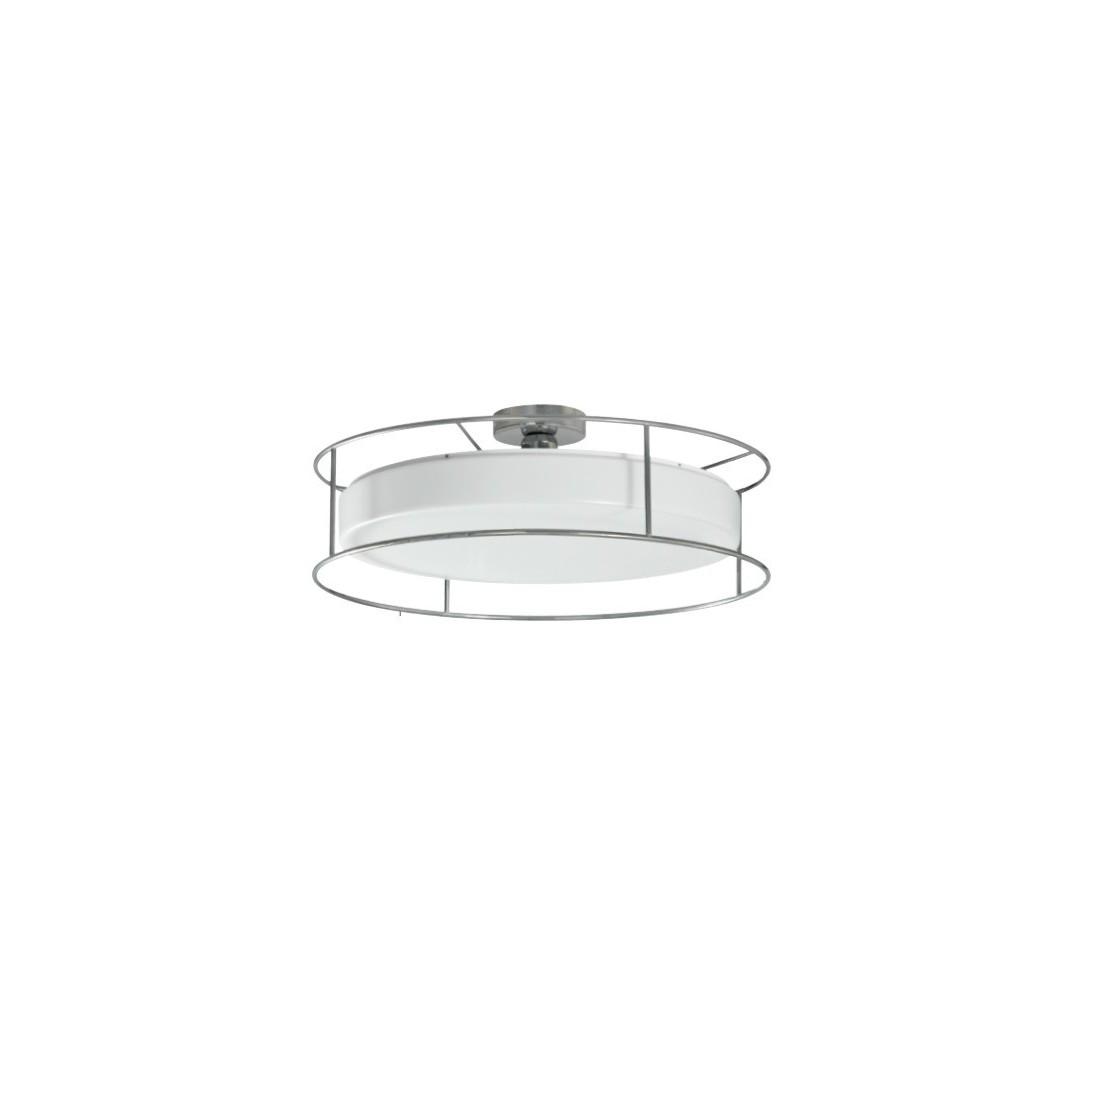 Apliques para zonas de paso exteriores apliques led for Apliques de pared exterior led